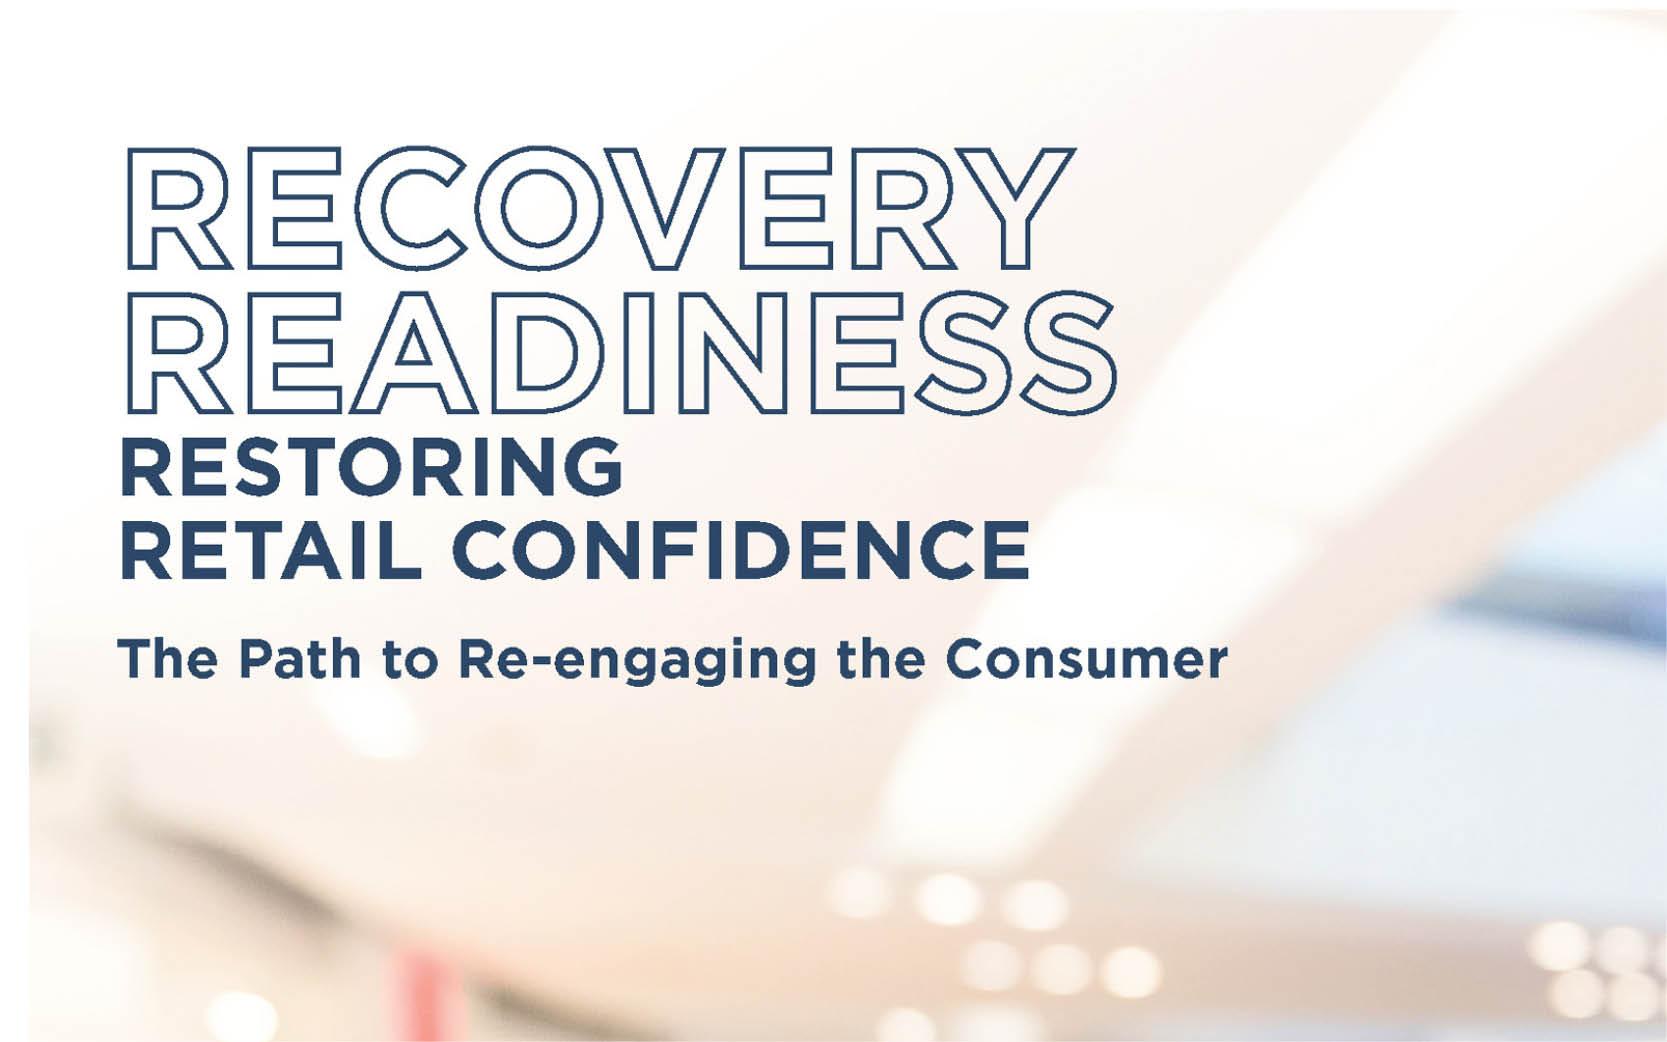 Image - Restoring Retail Confidence